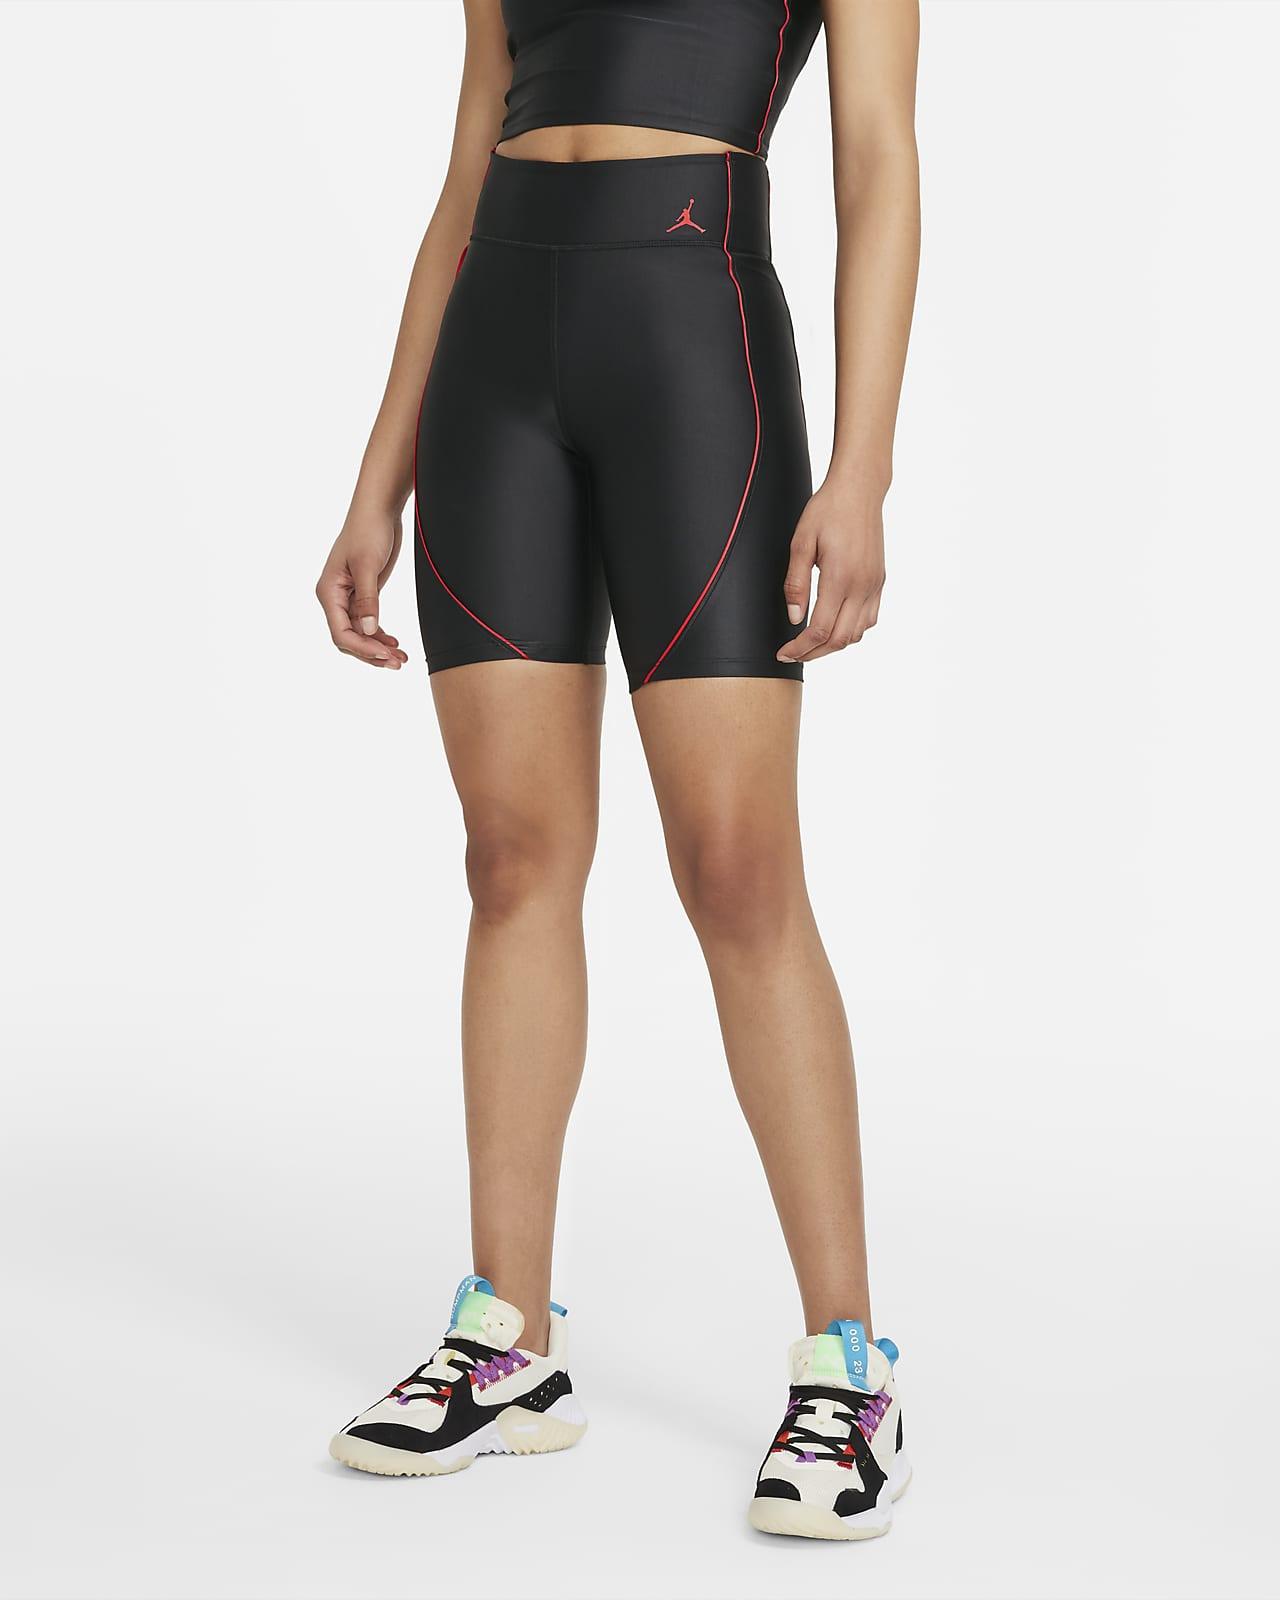 Jordan Essential Women's Bike Shorts